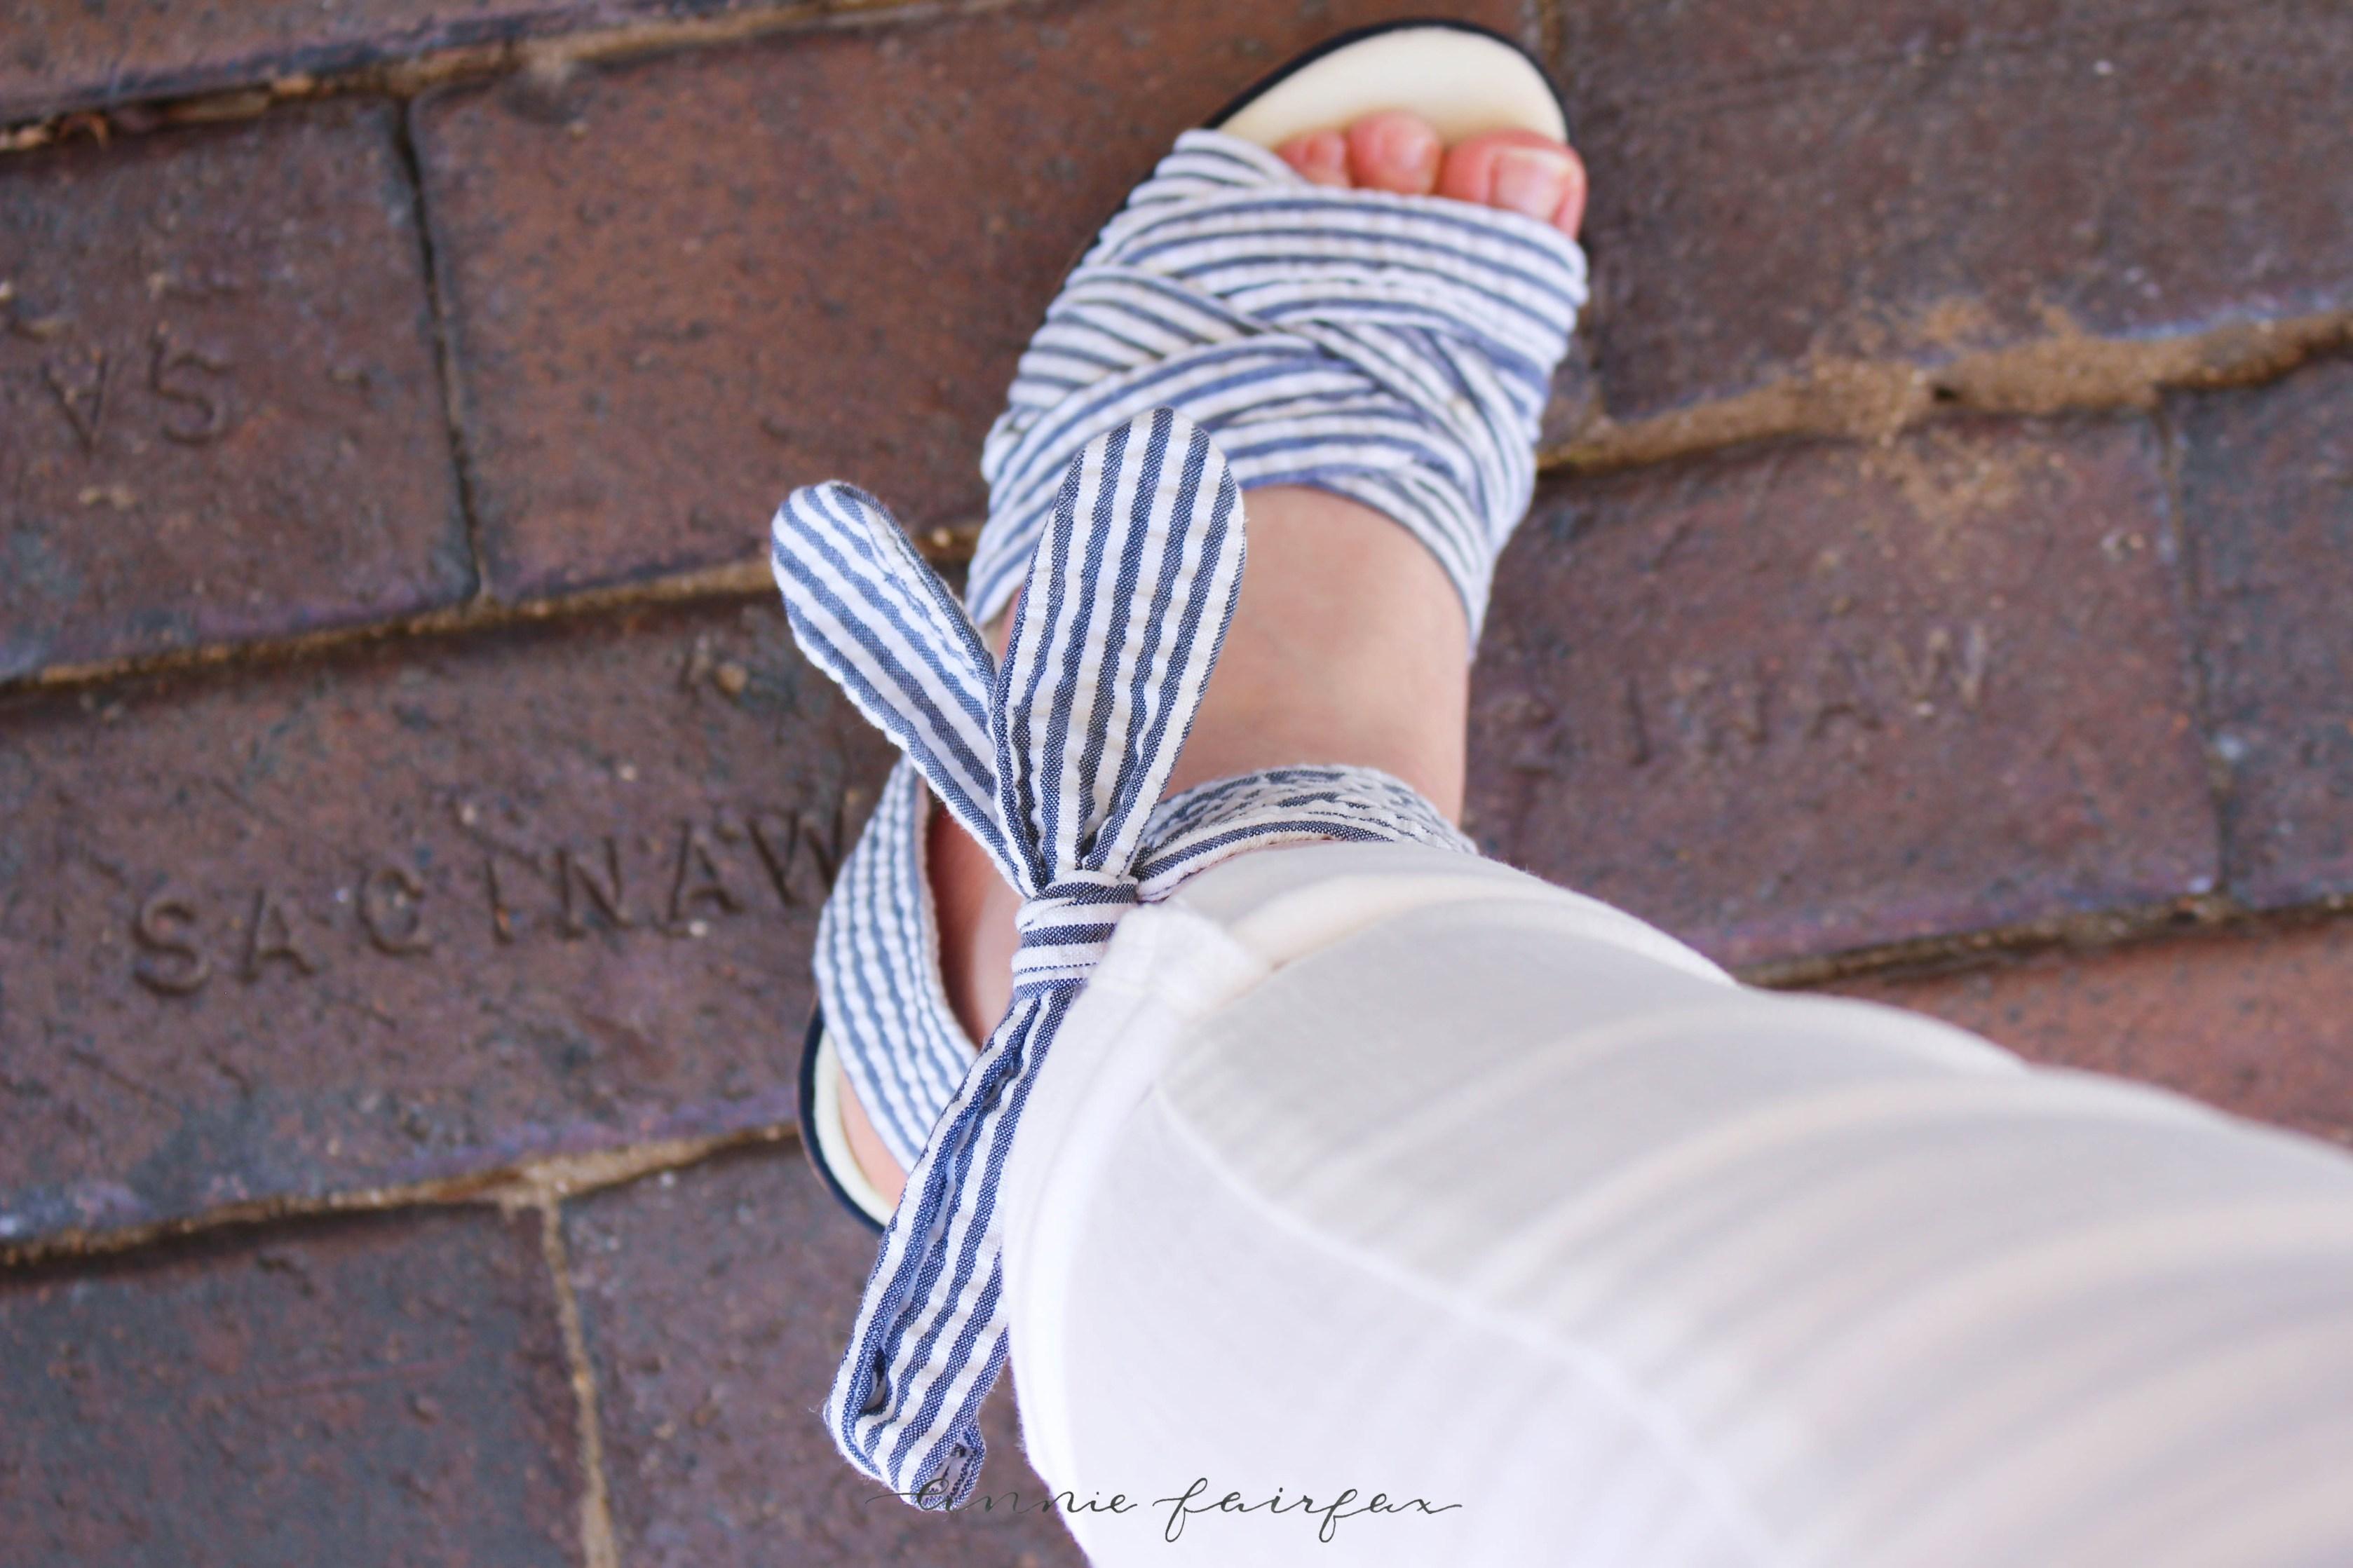 Blue Striped Nautical Top with Ruffle Sleeves by Annie Fairfax on AnnieWearsIt.Com